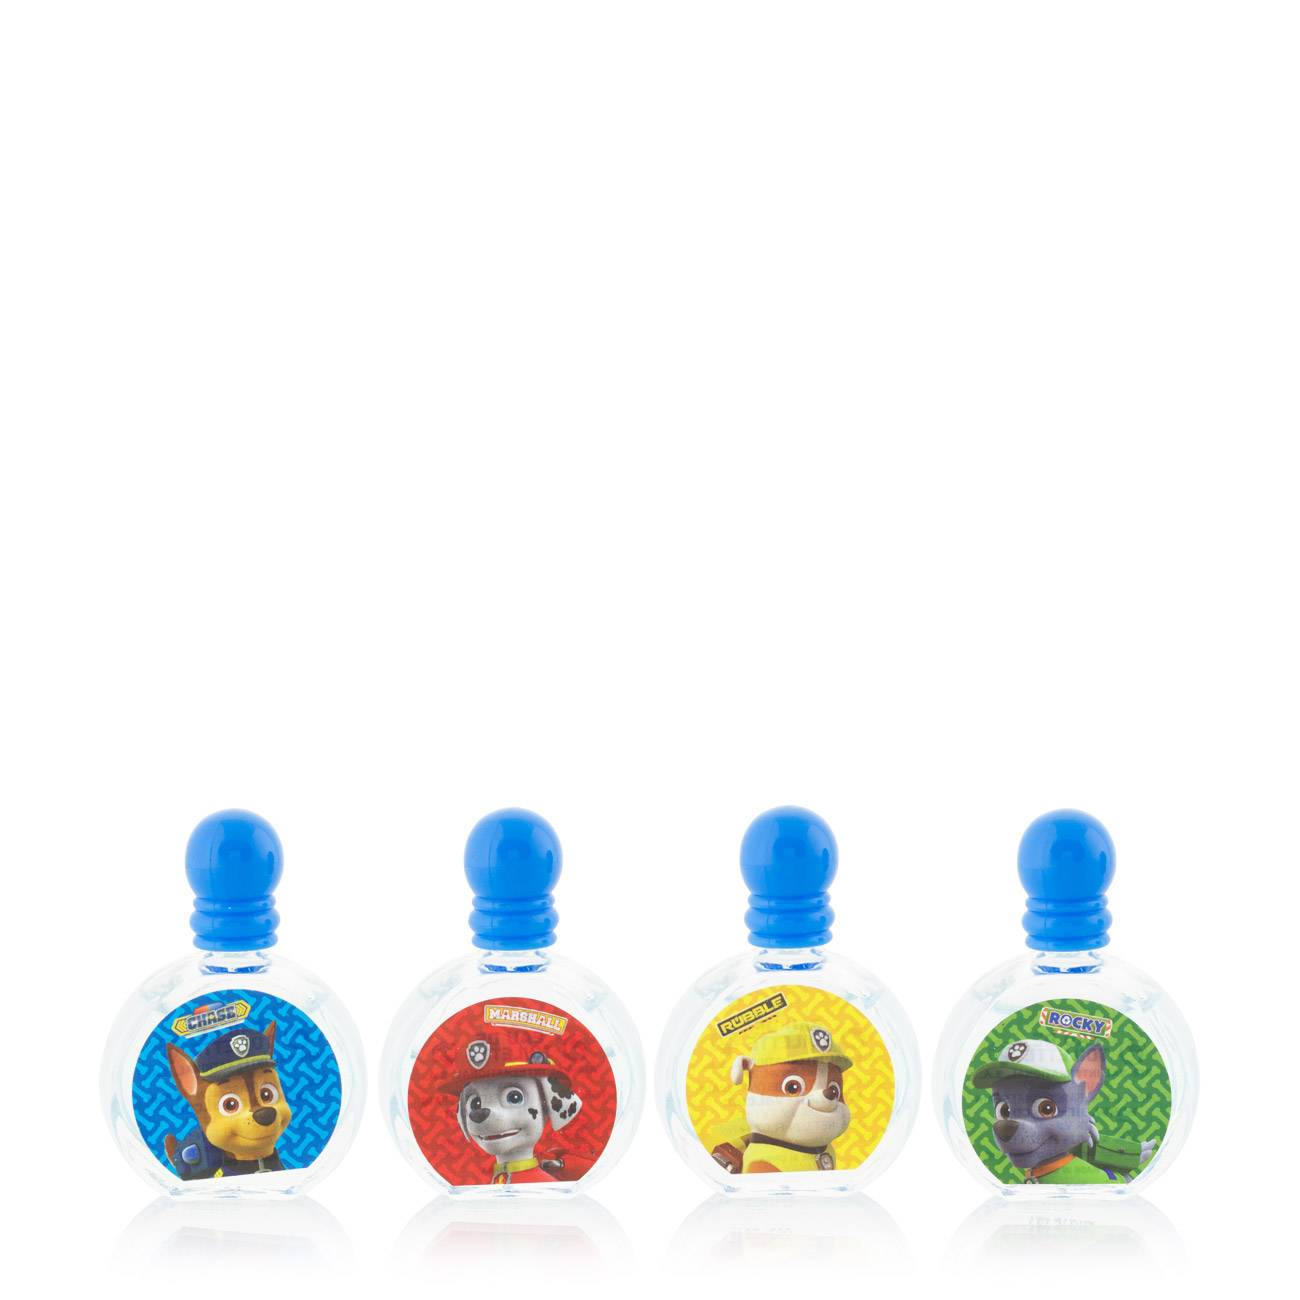 Paw Patrol Miniature Set 28ml Kids World imagine 2021 bestvalue.eu